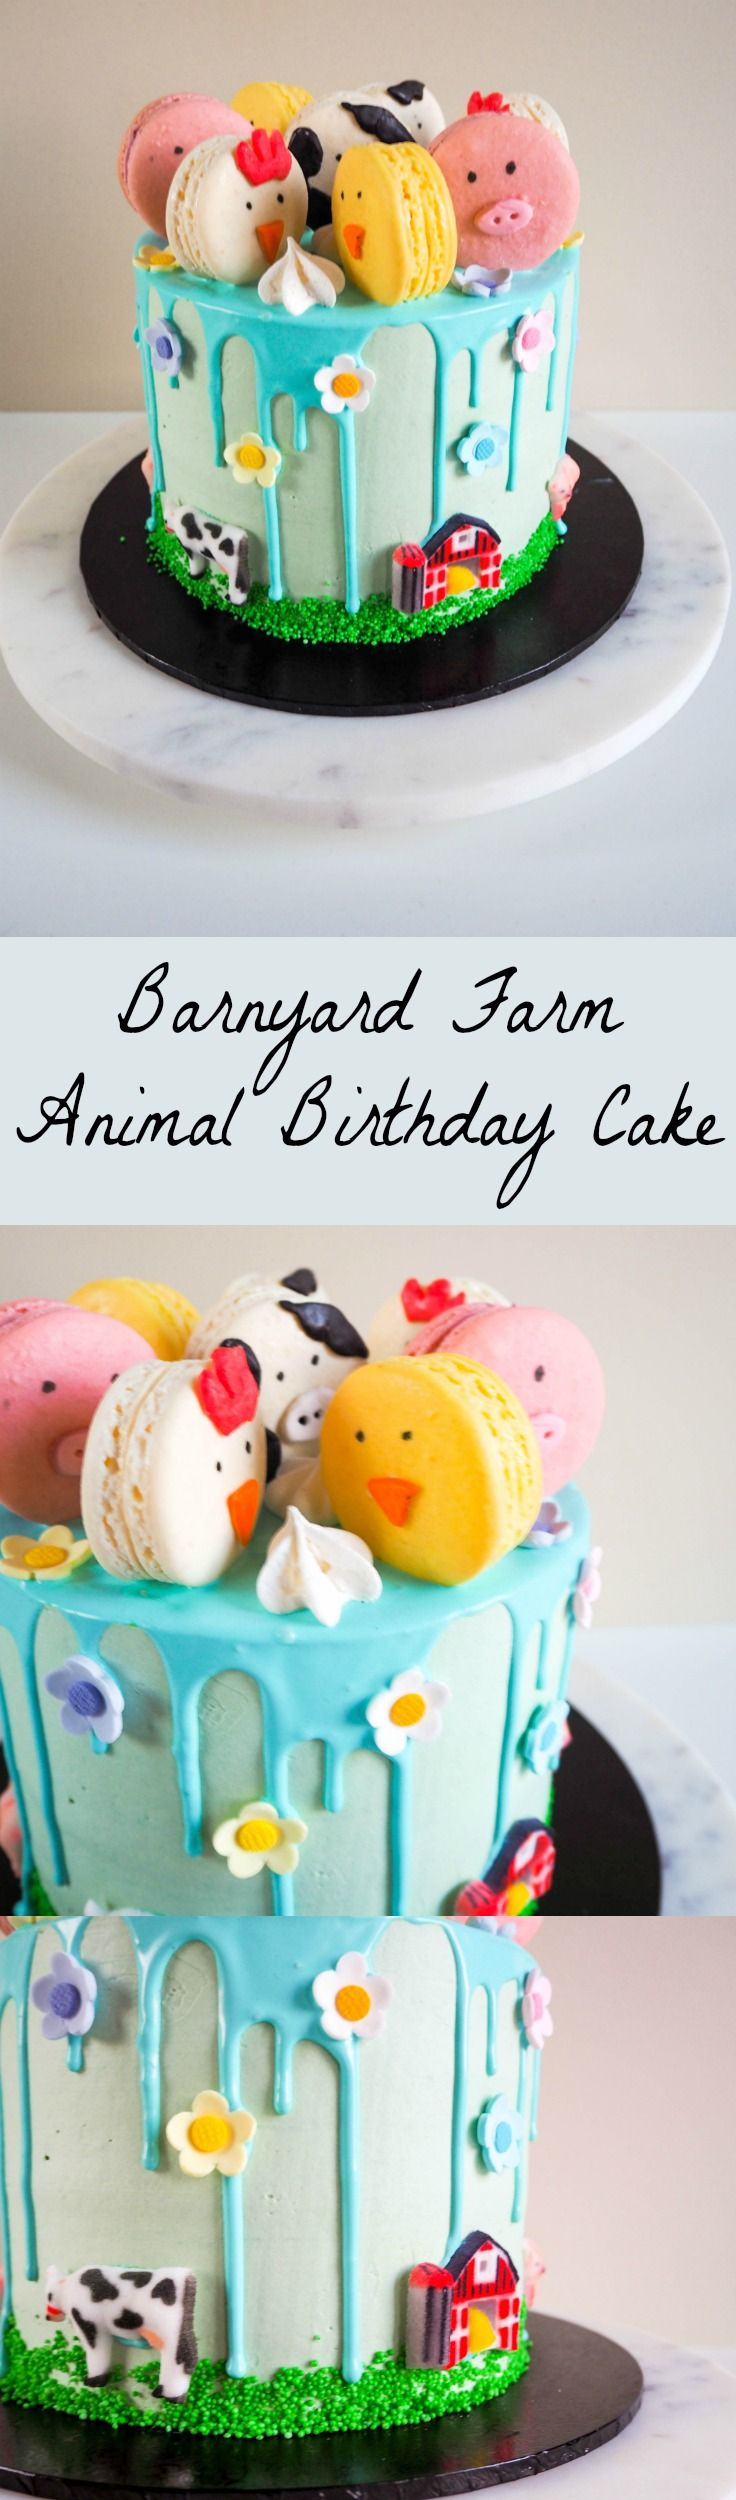 Barnyard Farm Animal Birthday Cake